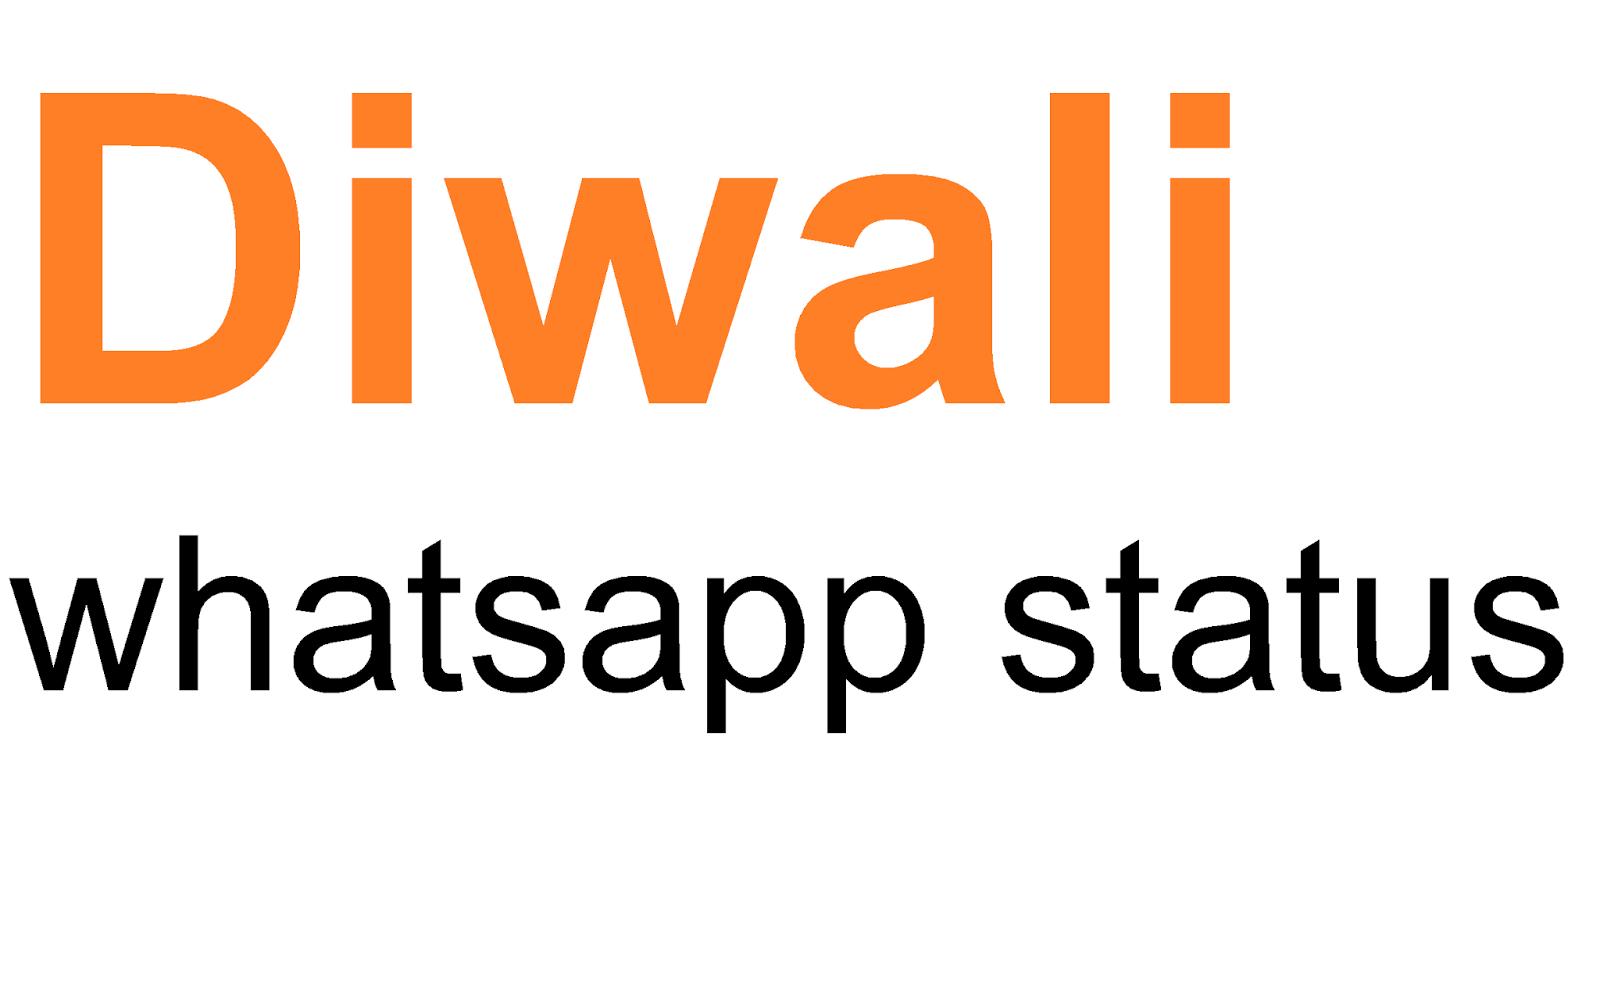 happy diwali whatsapp status whatsapp status. Black Bedroom Furniture Sets. Home Design Ideas